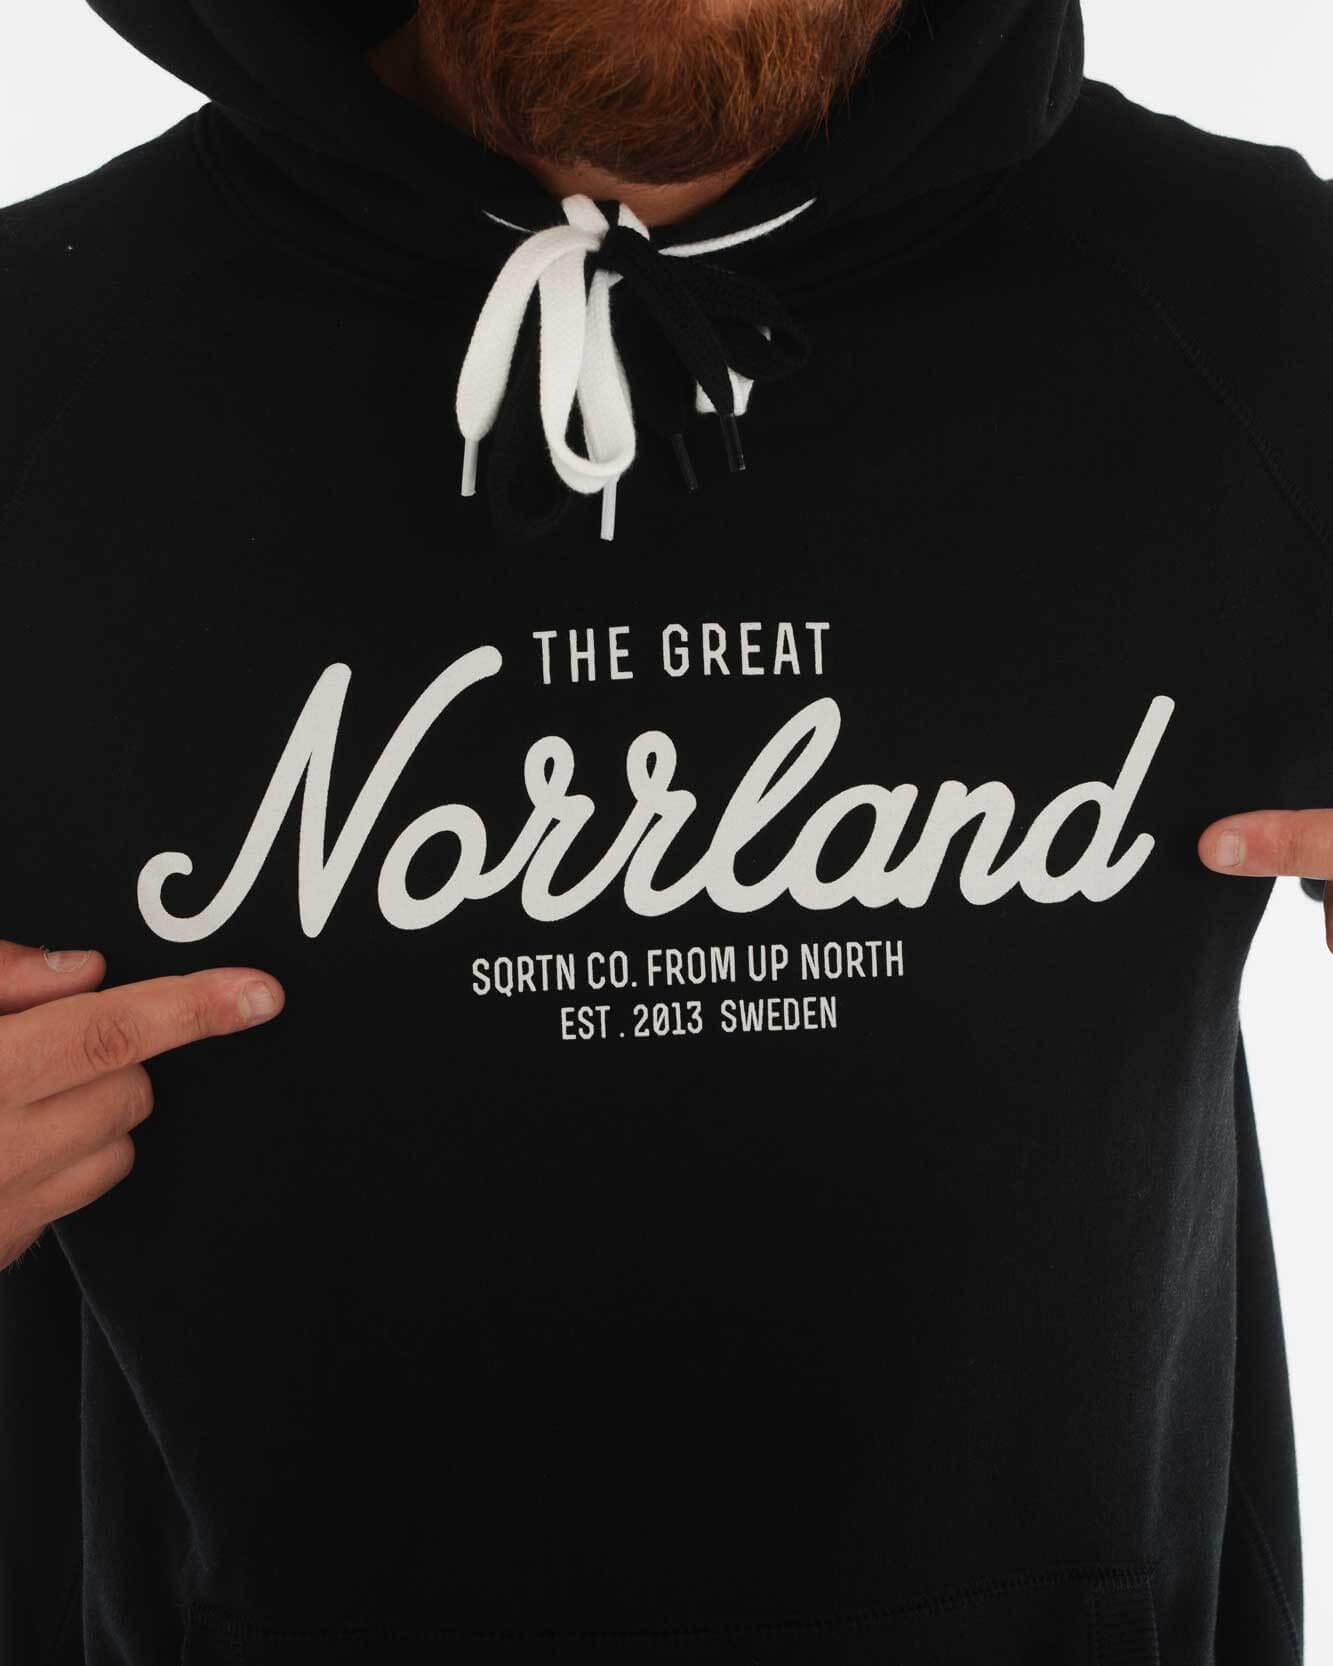 The Great Norrland Hoodies, t shirts, mössor och kepsar